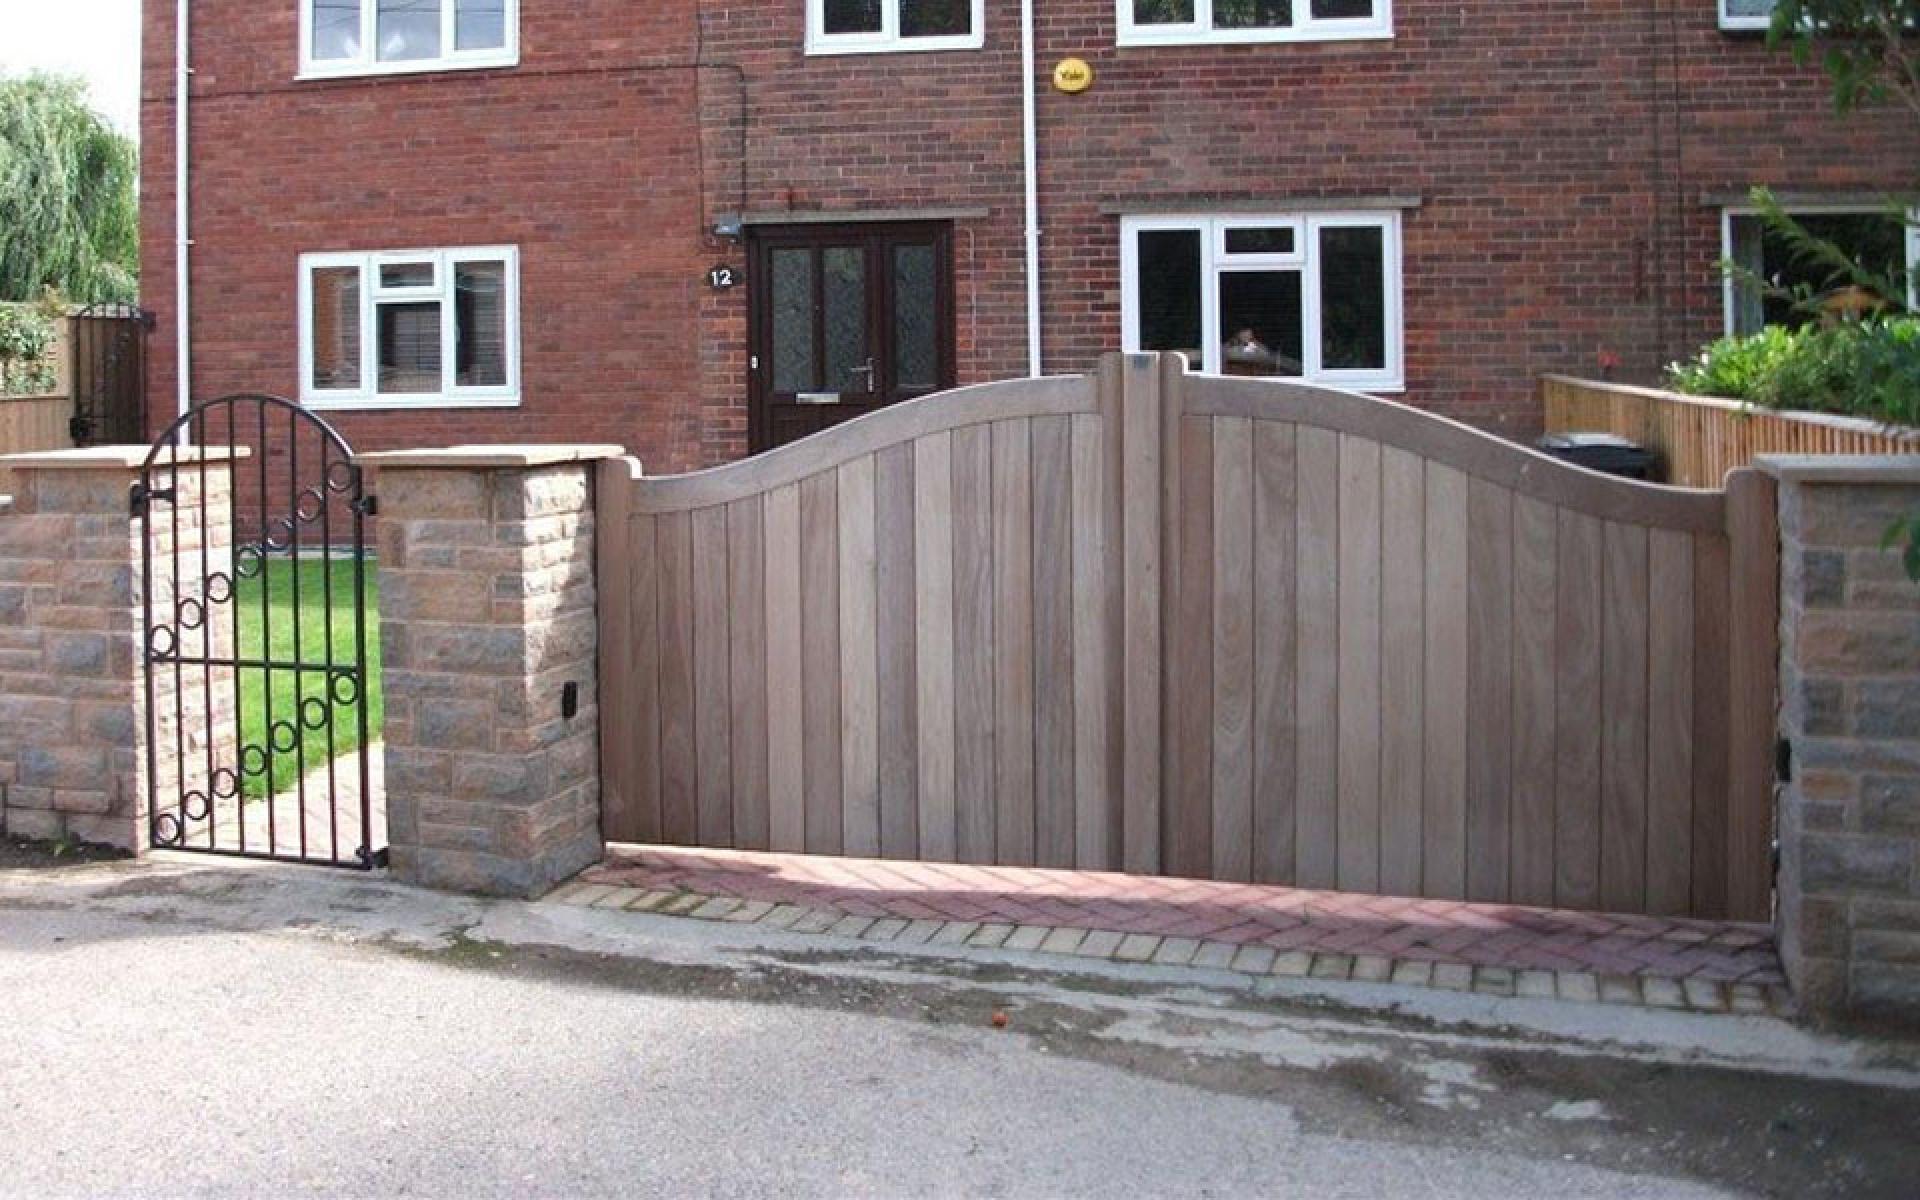 Prasha wooden gate (Courtesy of A1 Gates & Securities)